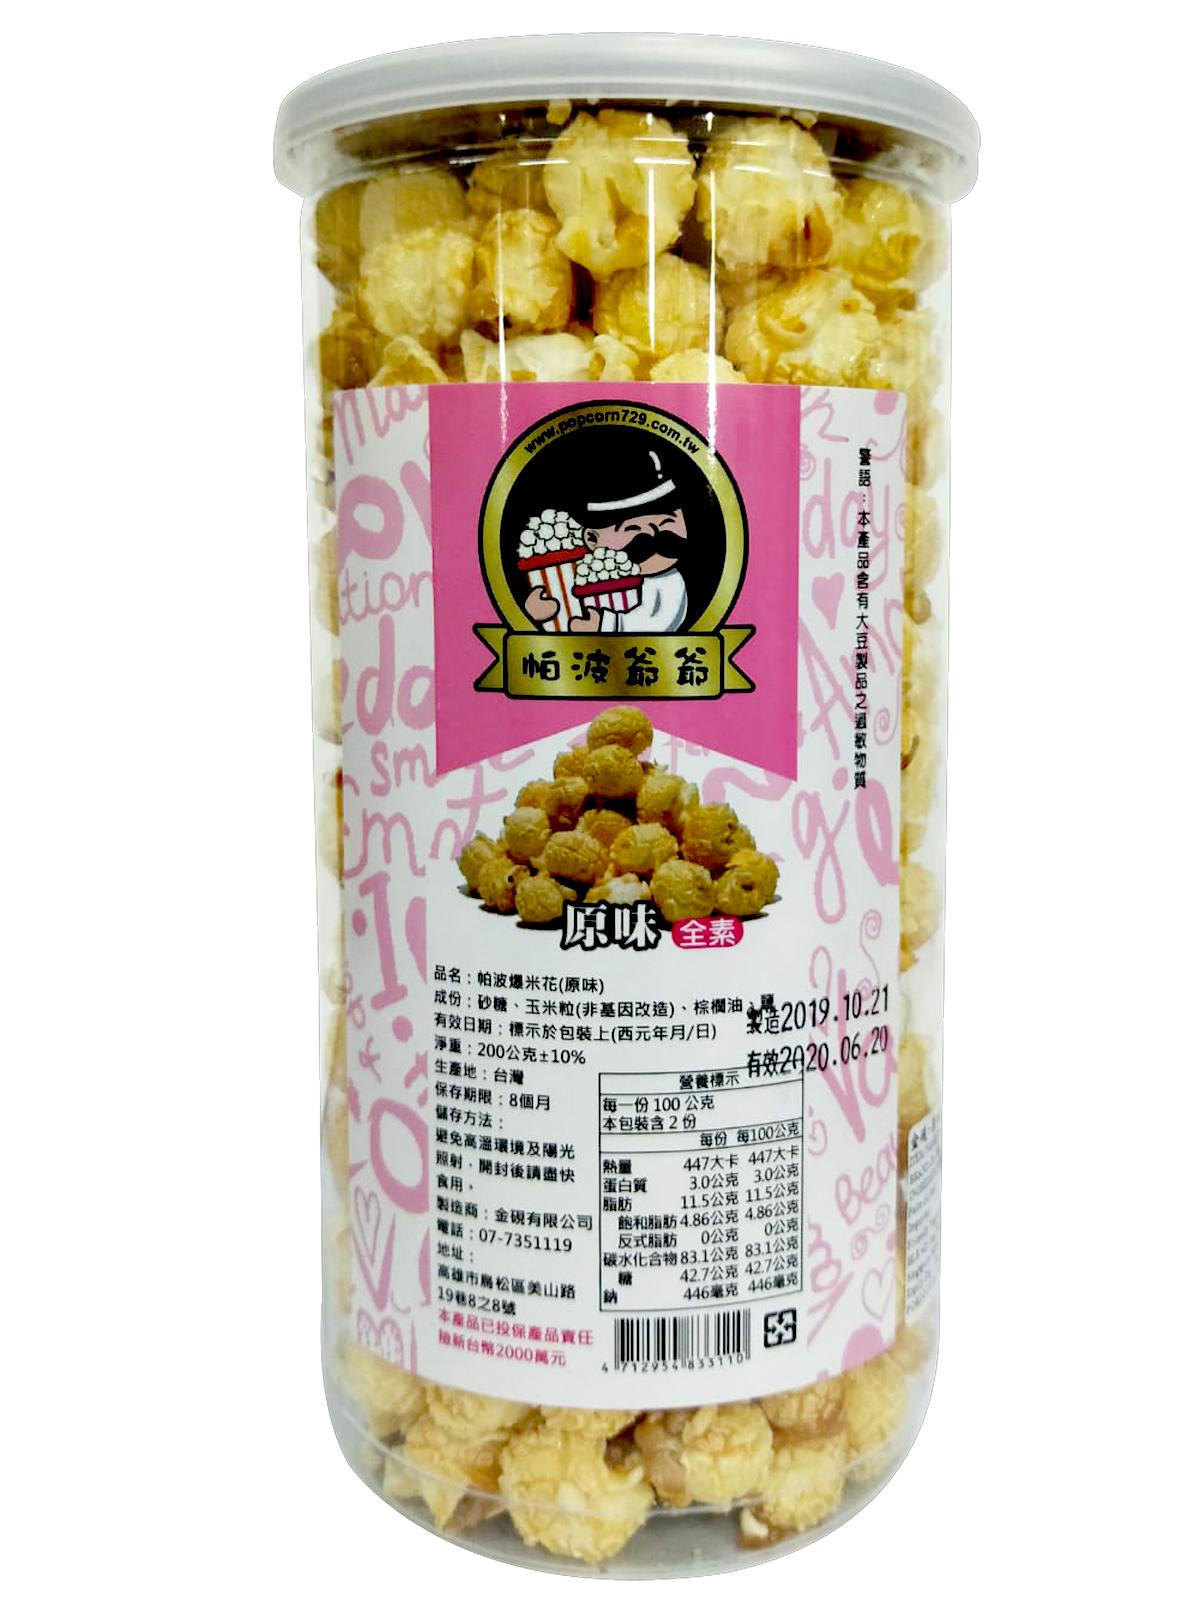 Image Papo Popcorn Original 金砚-原味爆米花 200grams